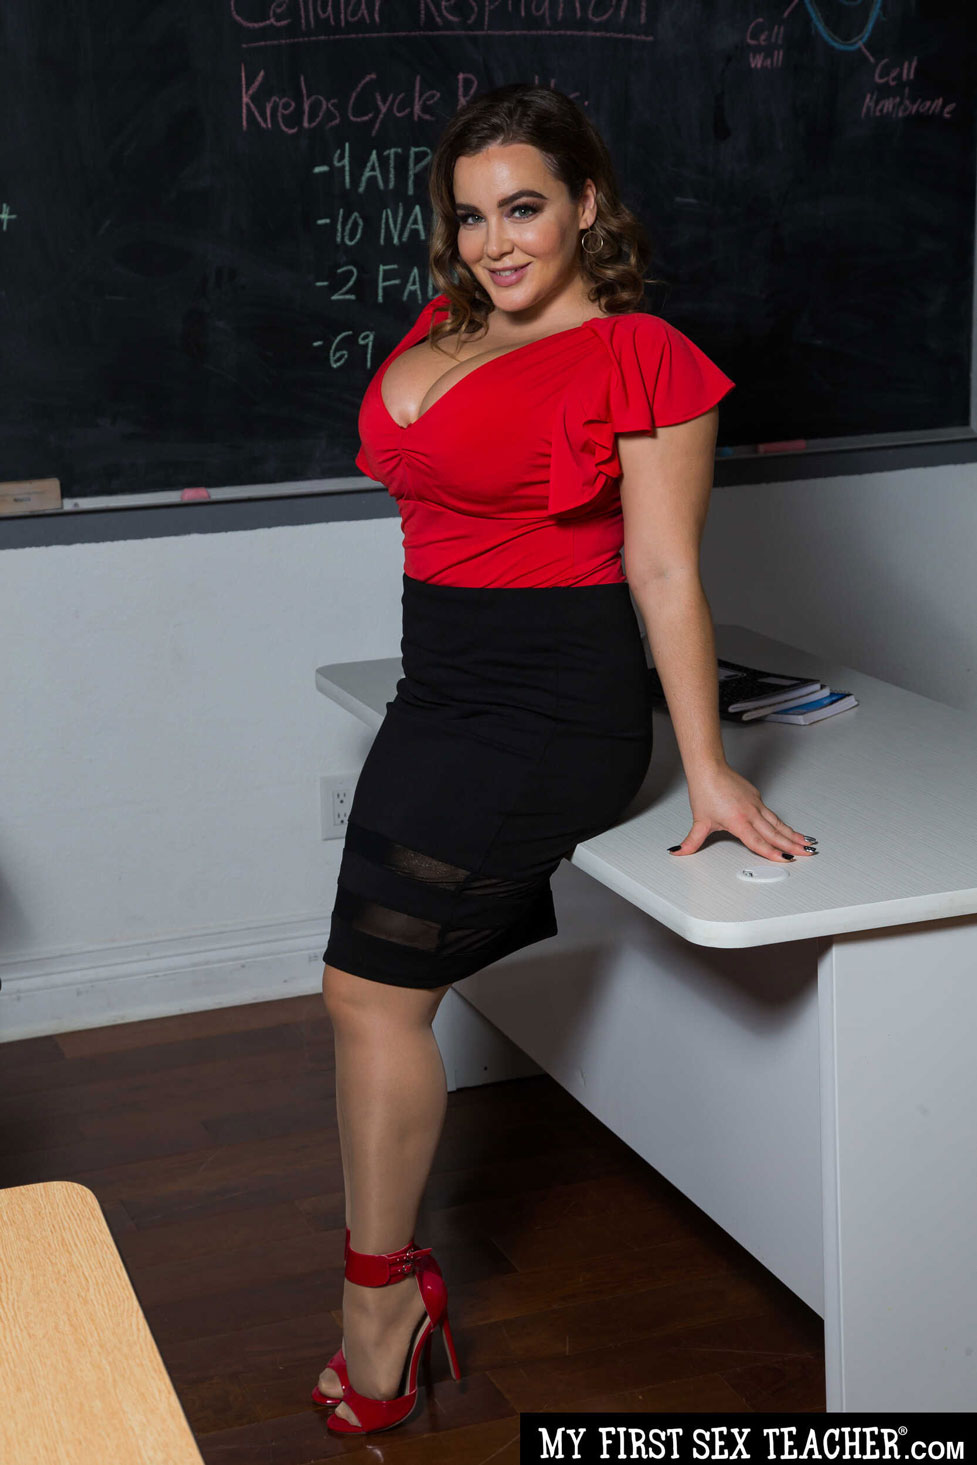 NATASHA NICE BUSTY TEACHER